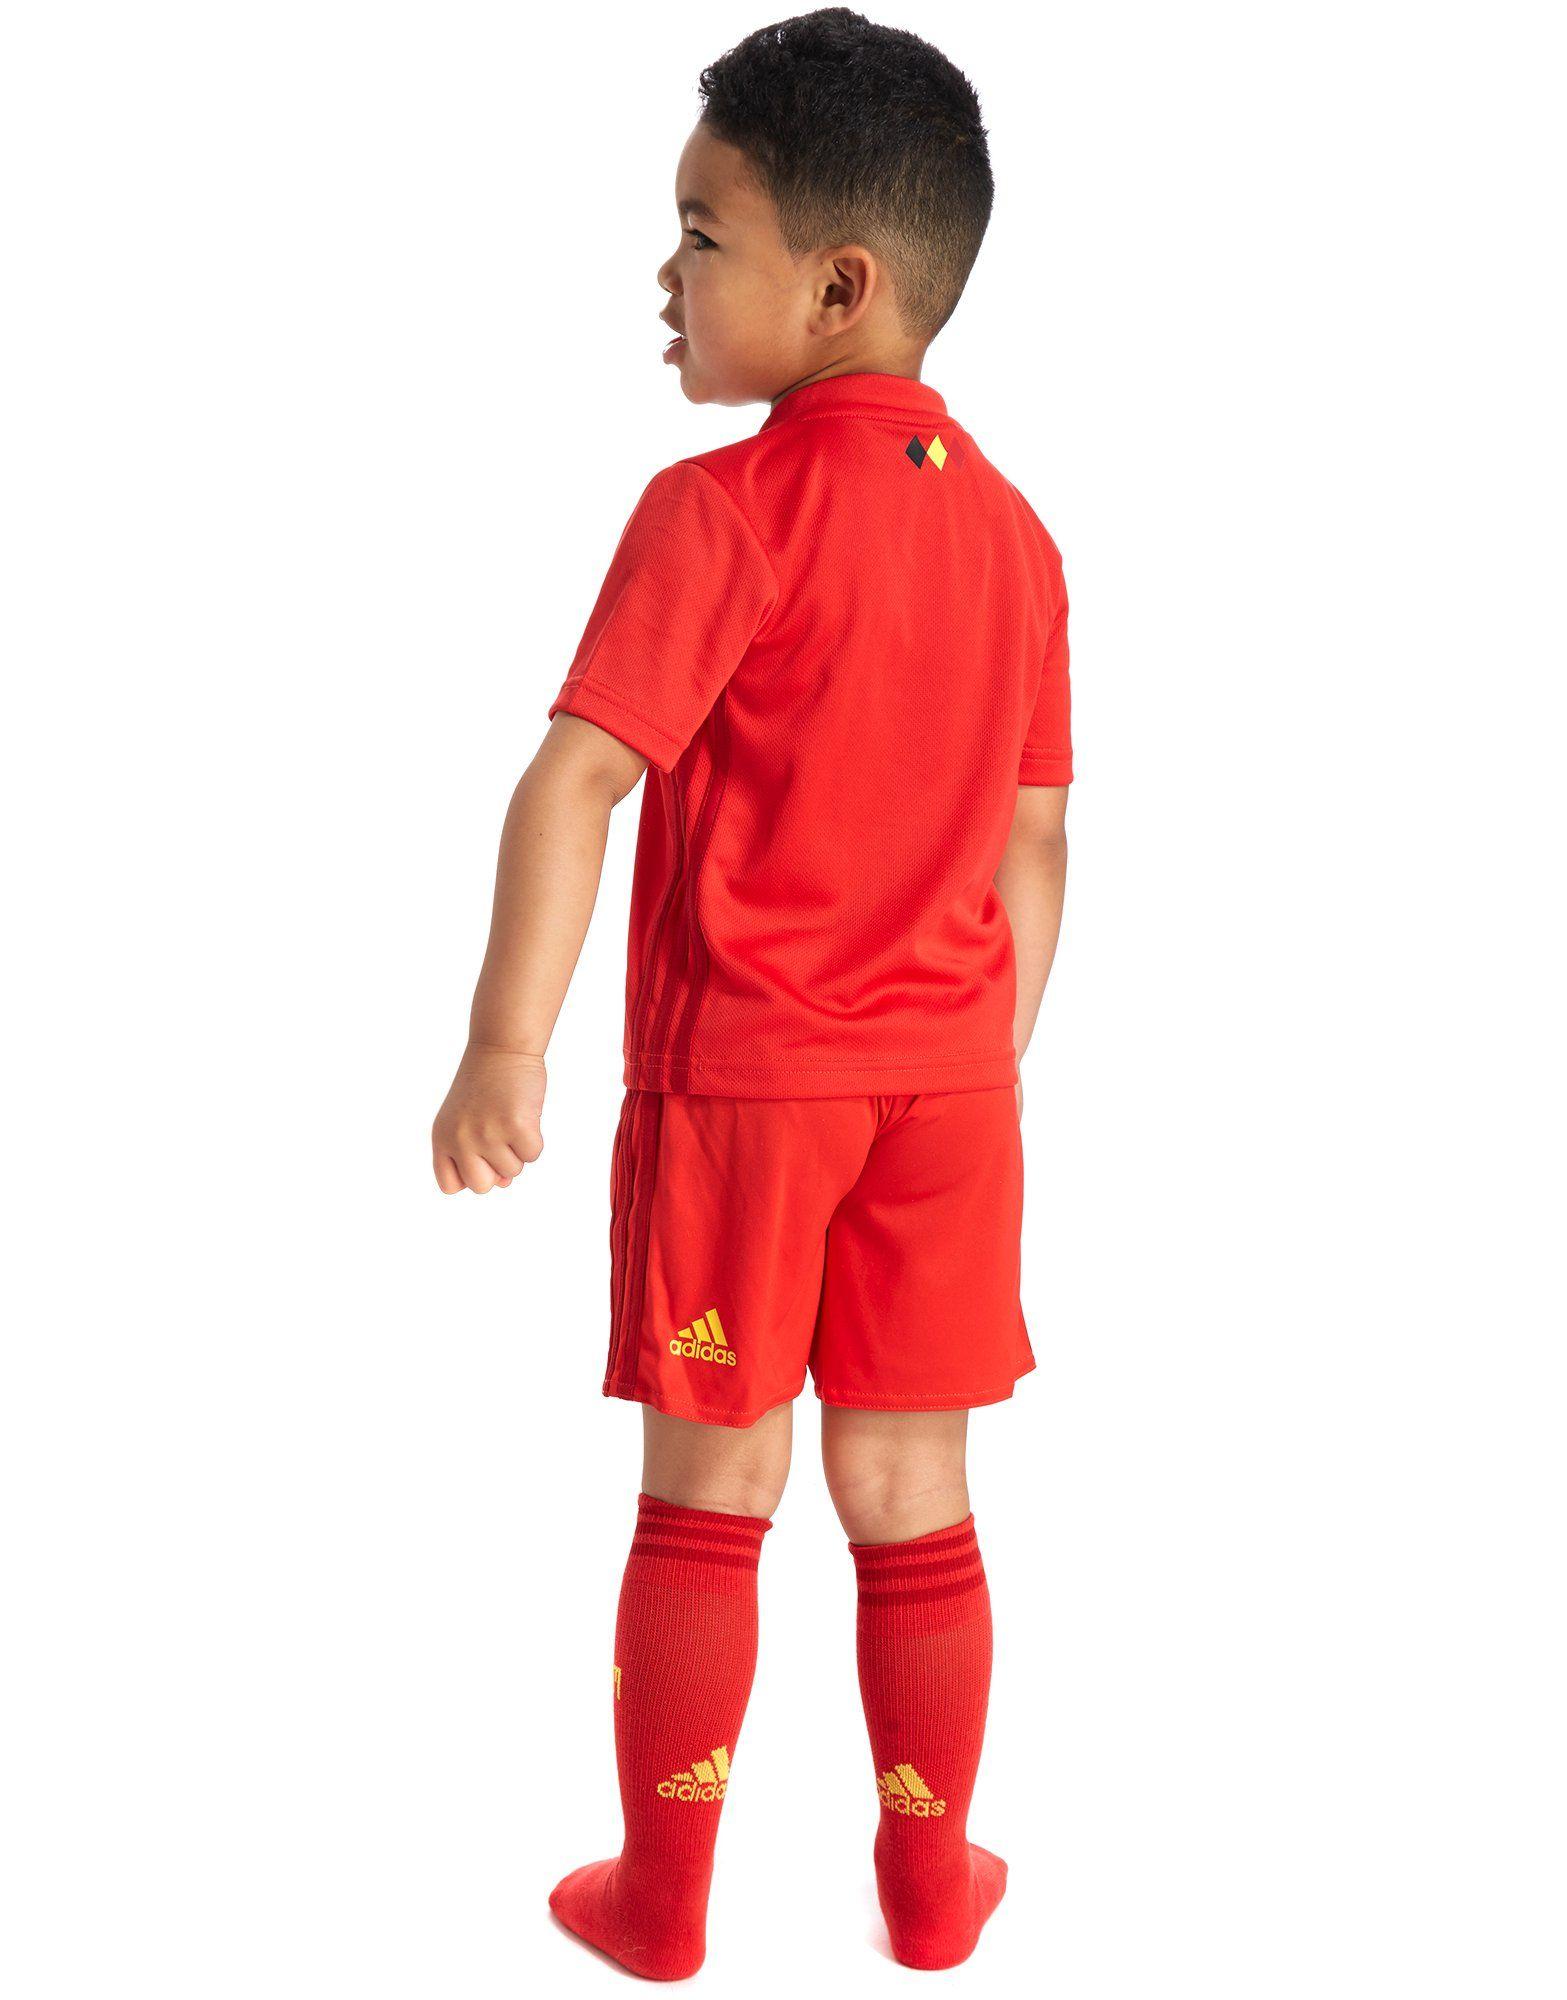 adidas conjunto Bélgica 2017/18 Mini infantil